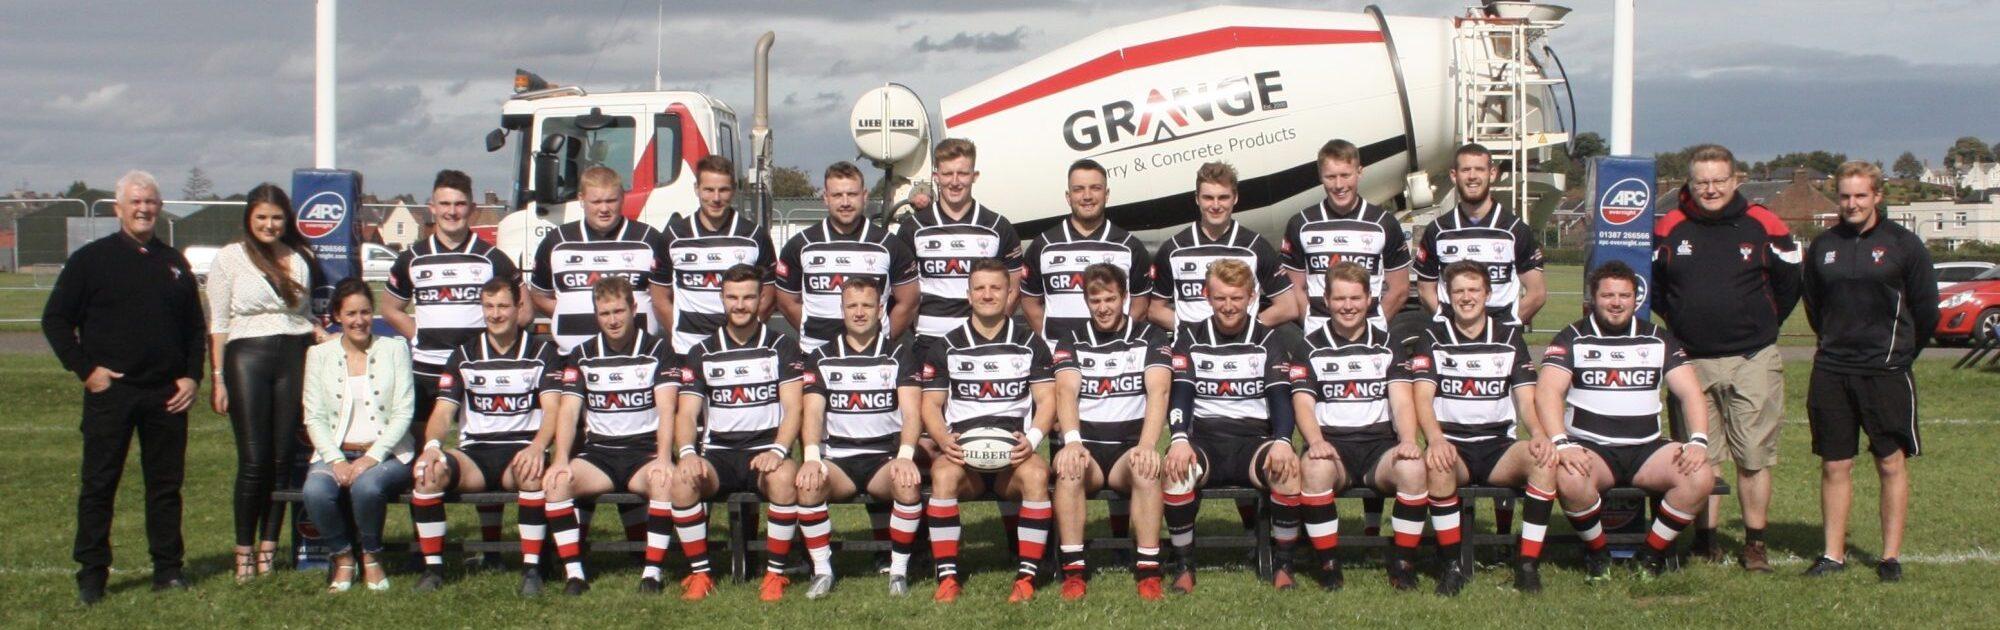 Dumfries Saints Rugby Club